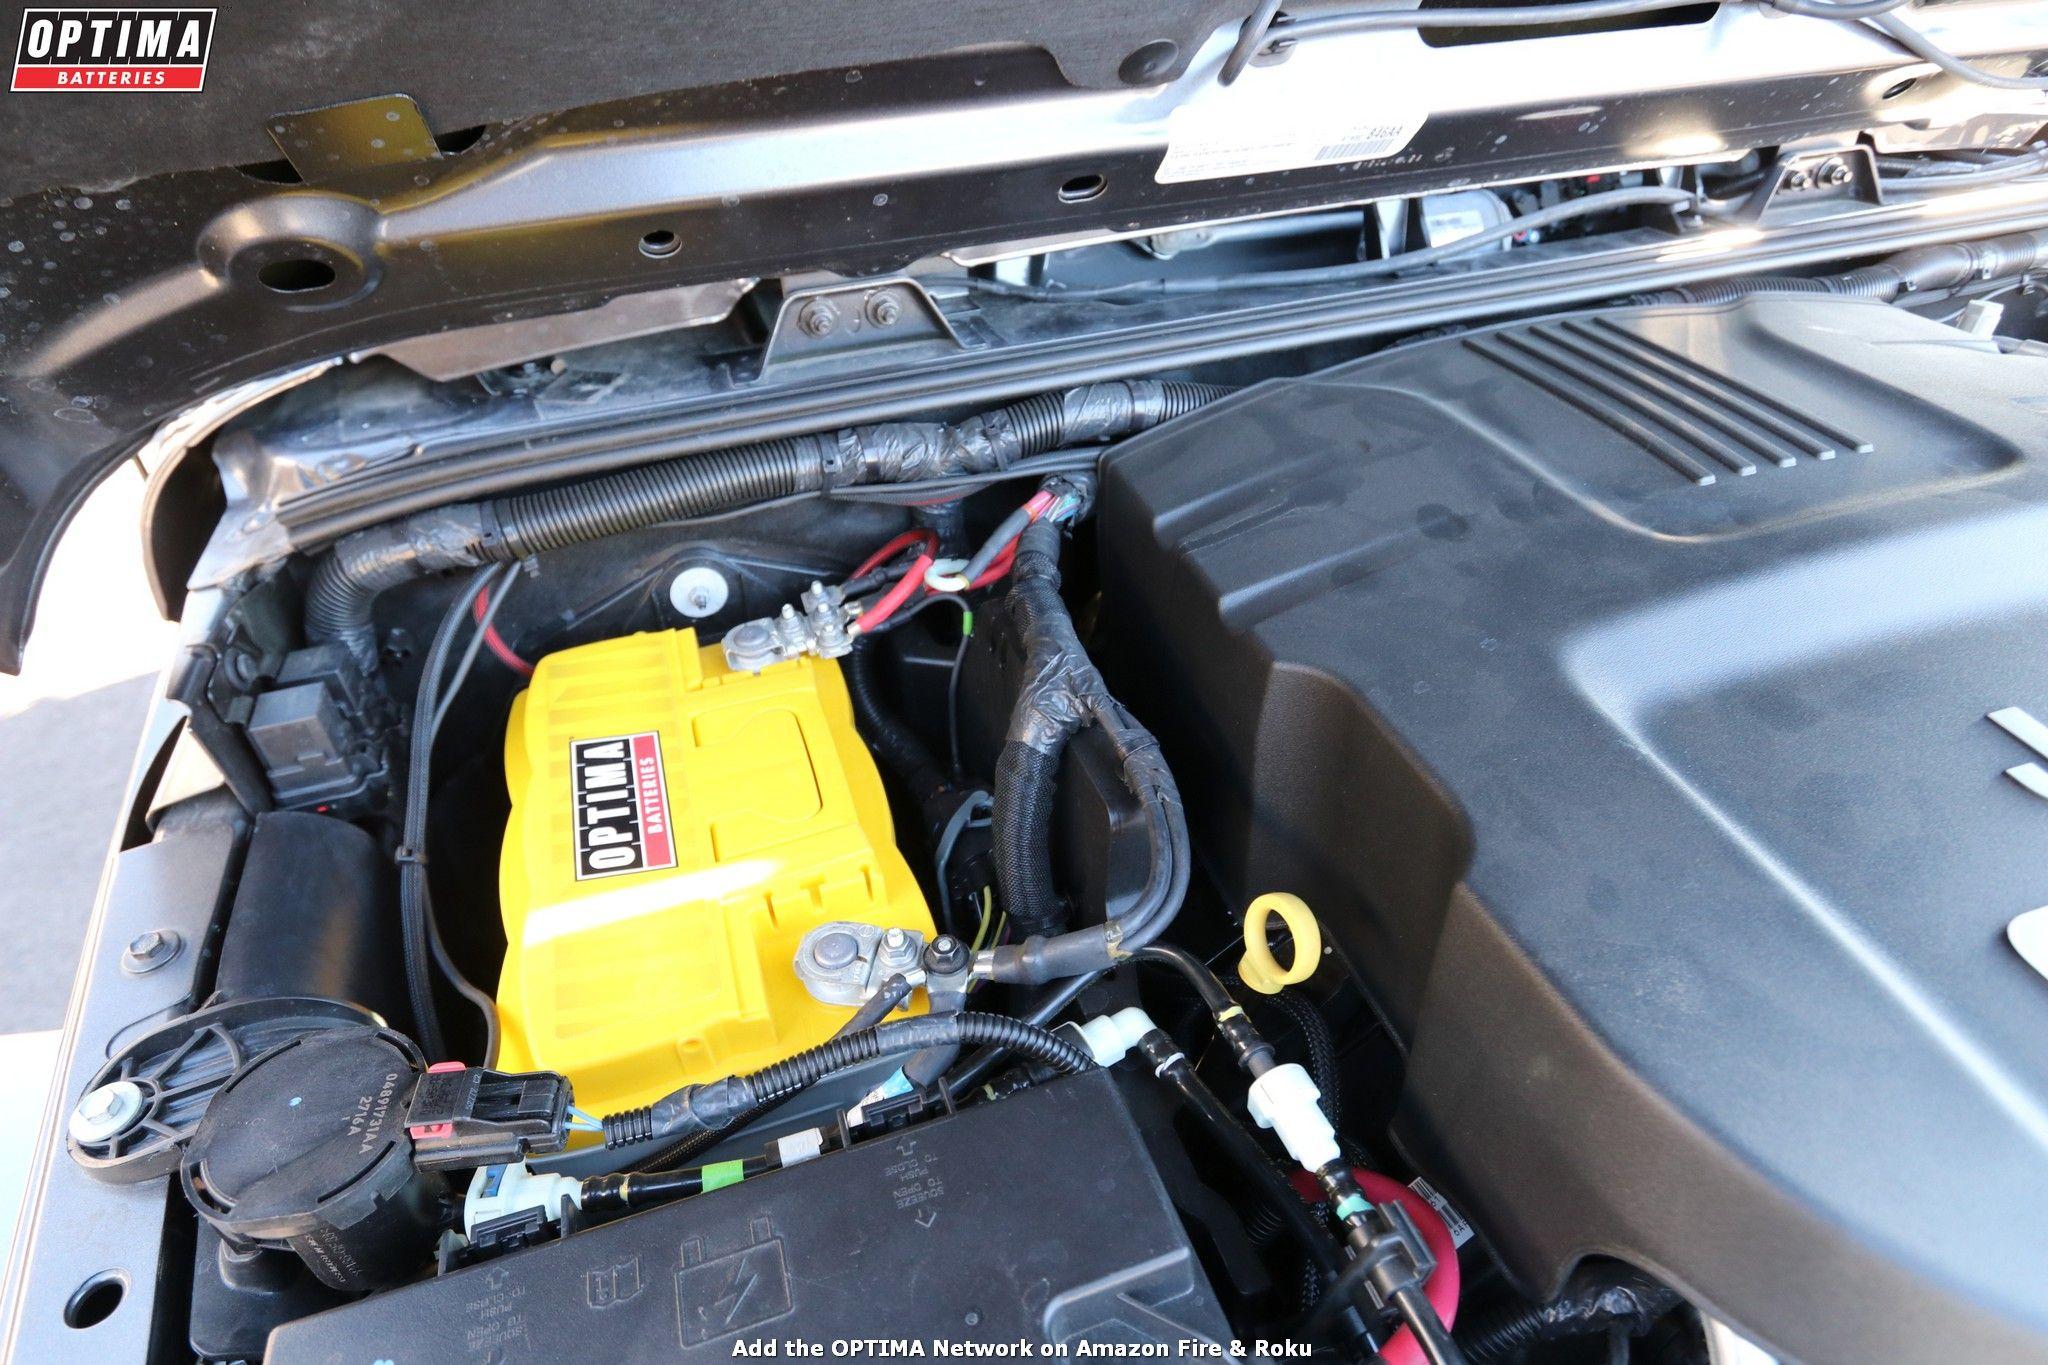 2014 Jeep Wrangler Battery 2014 Jeep Wrangler Jeep Wrangler Jeep Brand